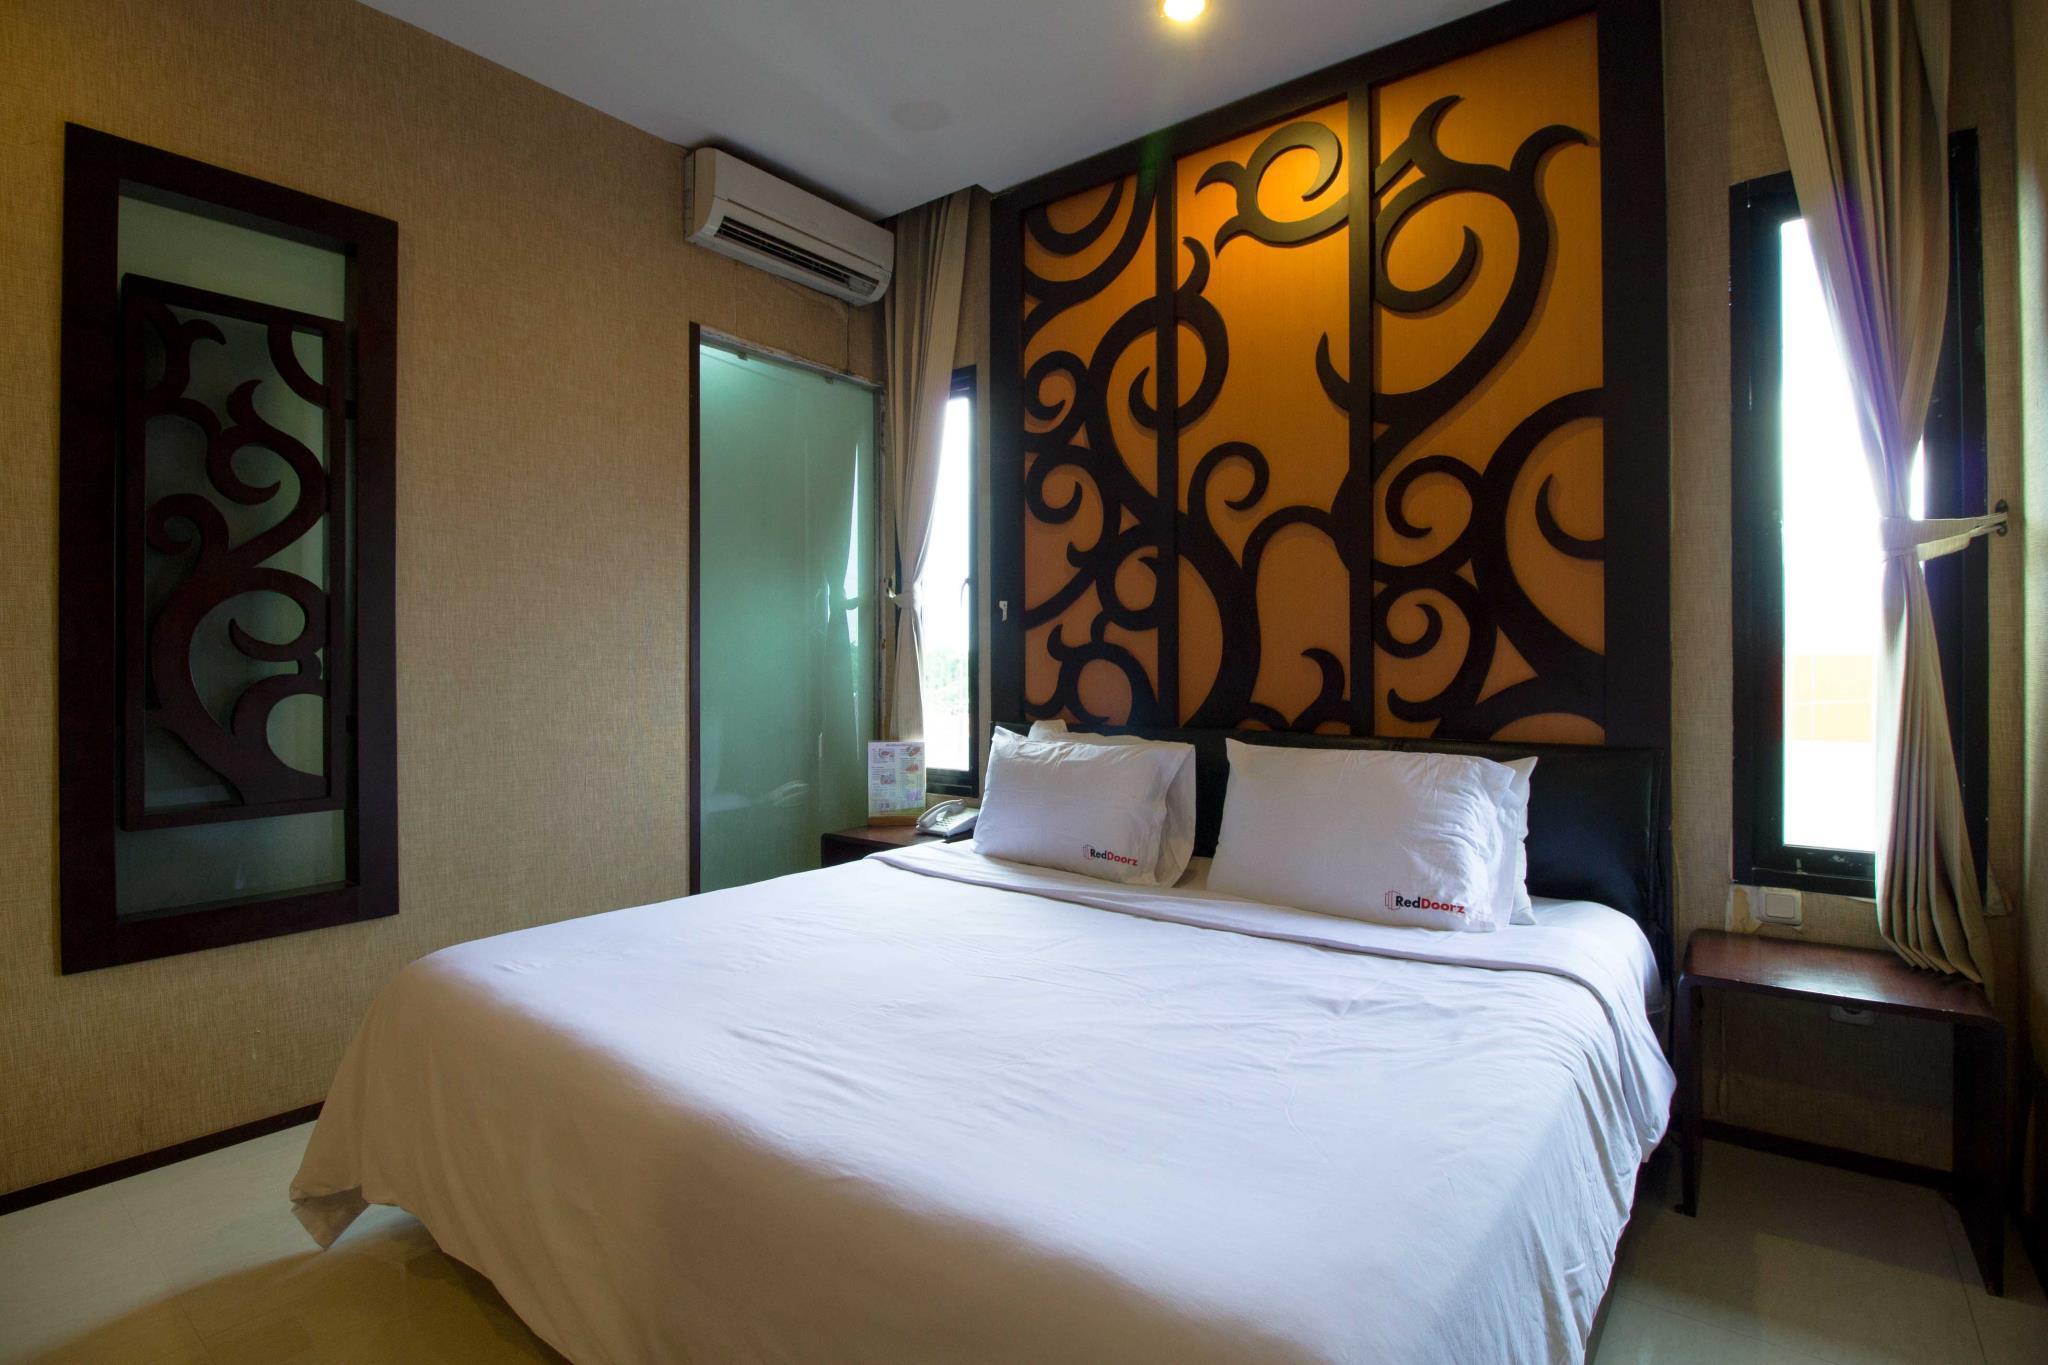 Hotel Paprica 1 Hotel Dekat Pasar Keputran Tarif Hotel Terbaik Yang Berada Di